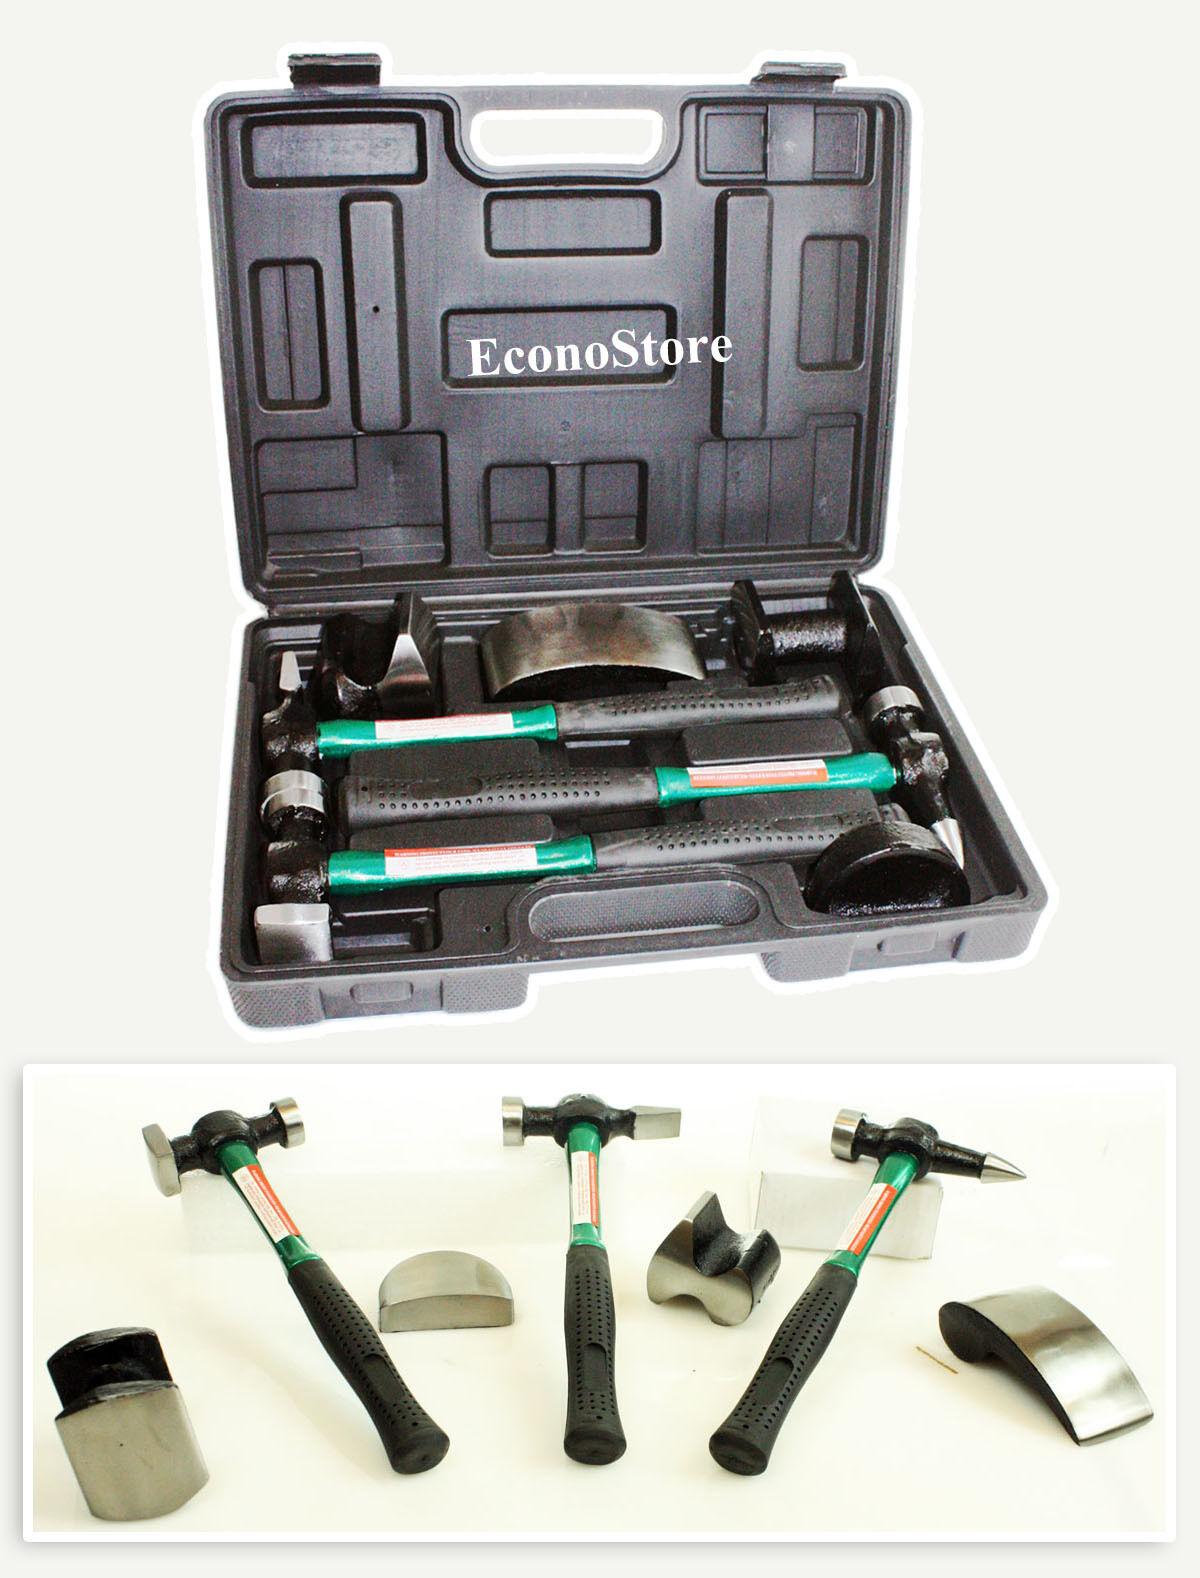 Body shop supplies usa tools automotive tools equipment for Parlour equipment